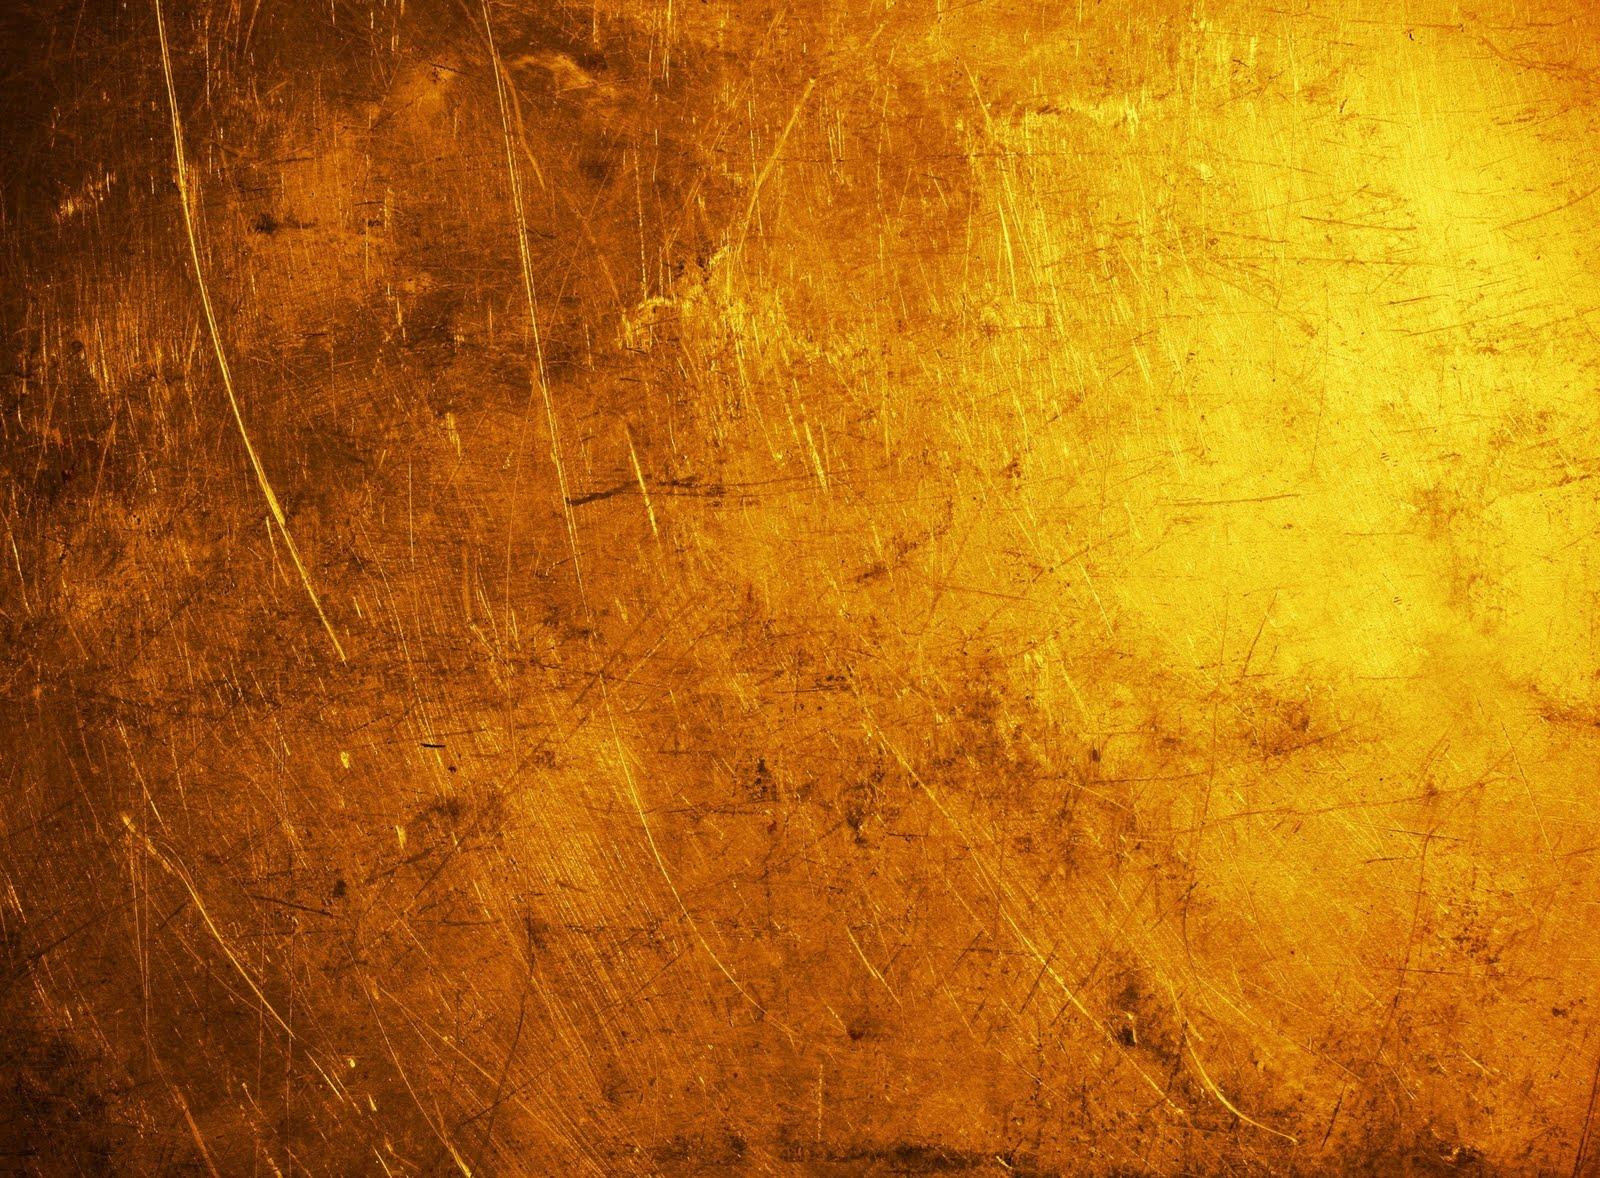 Gold texture rcc